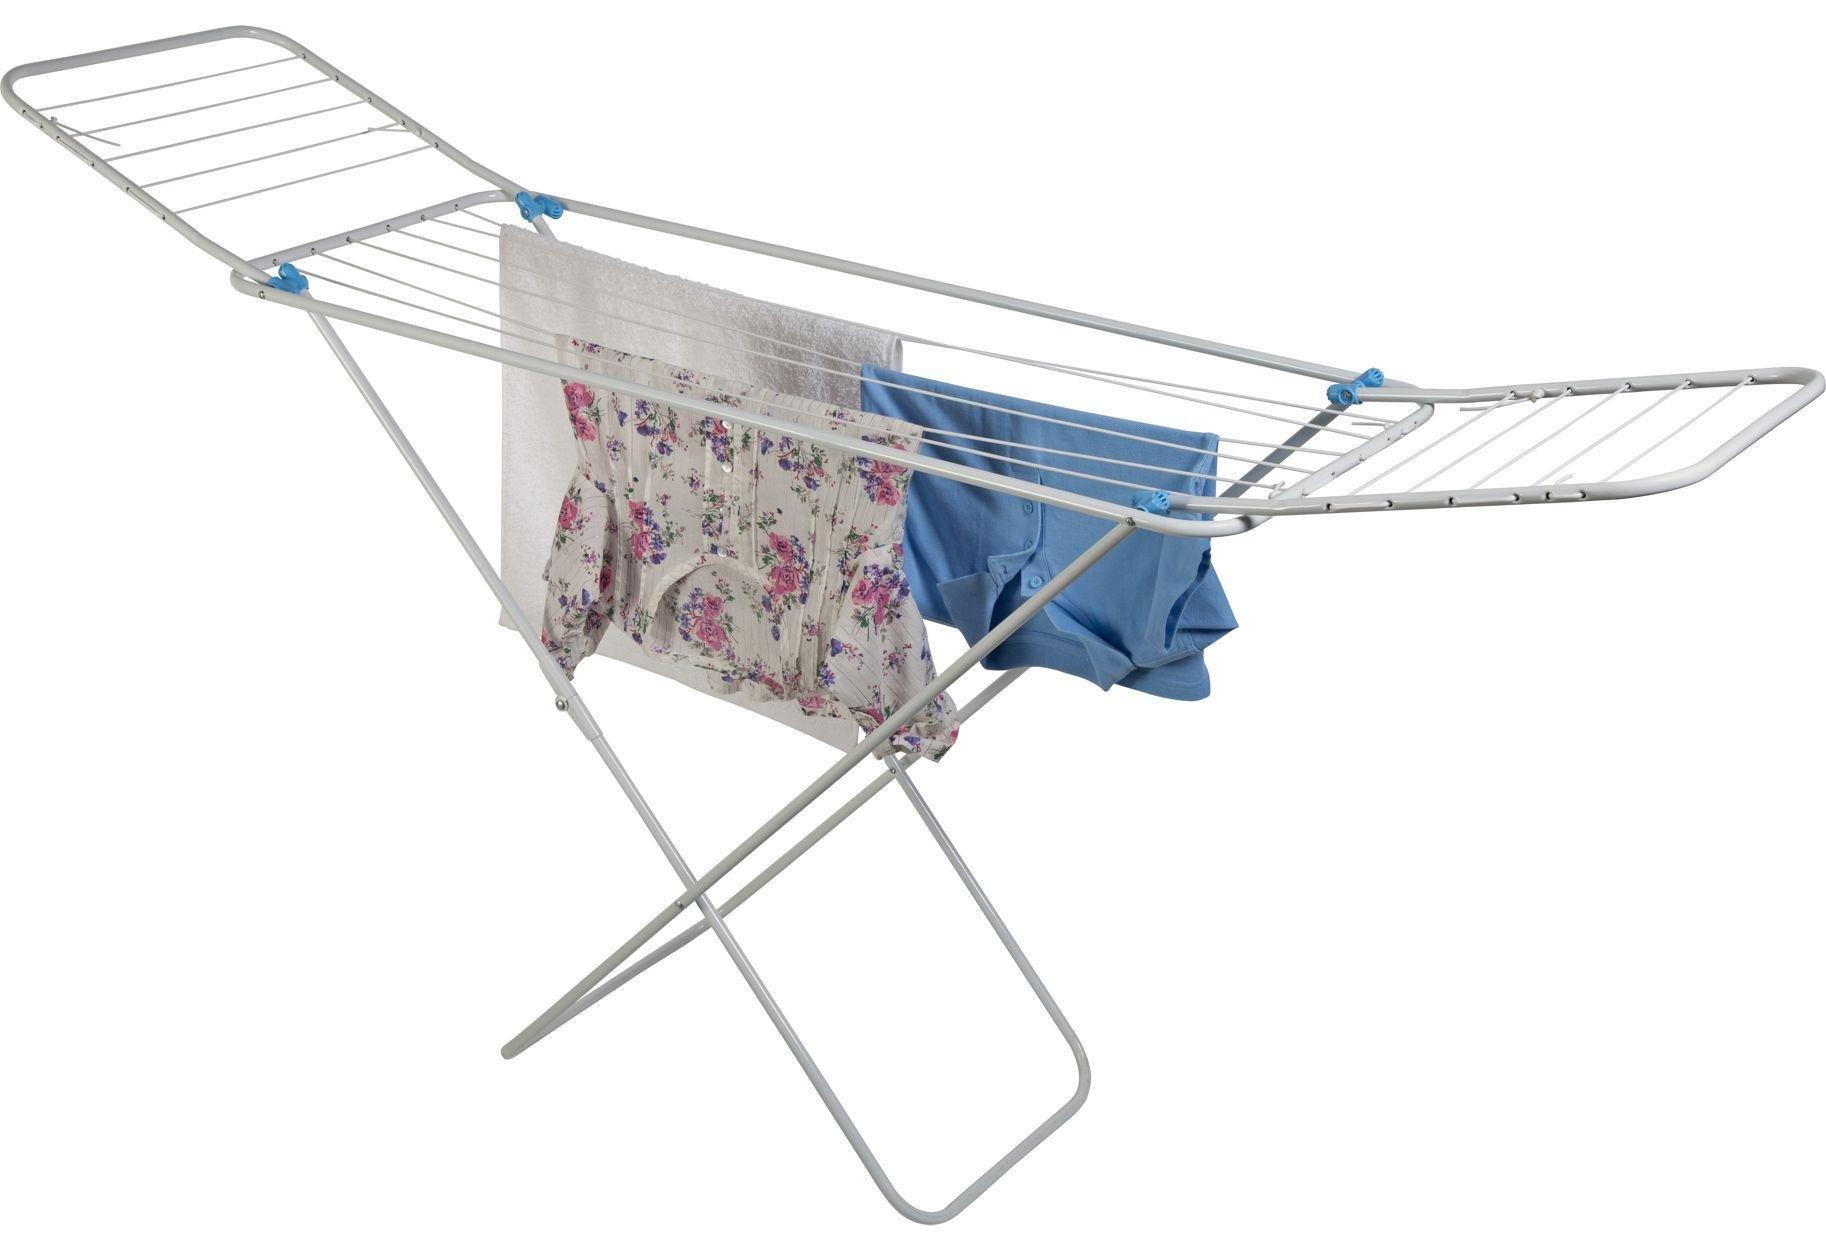 clothes airers designer homeware. Black Bedroom Furniture Sets. Home Design Ideas